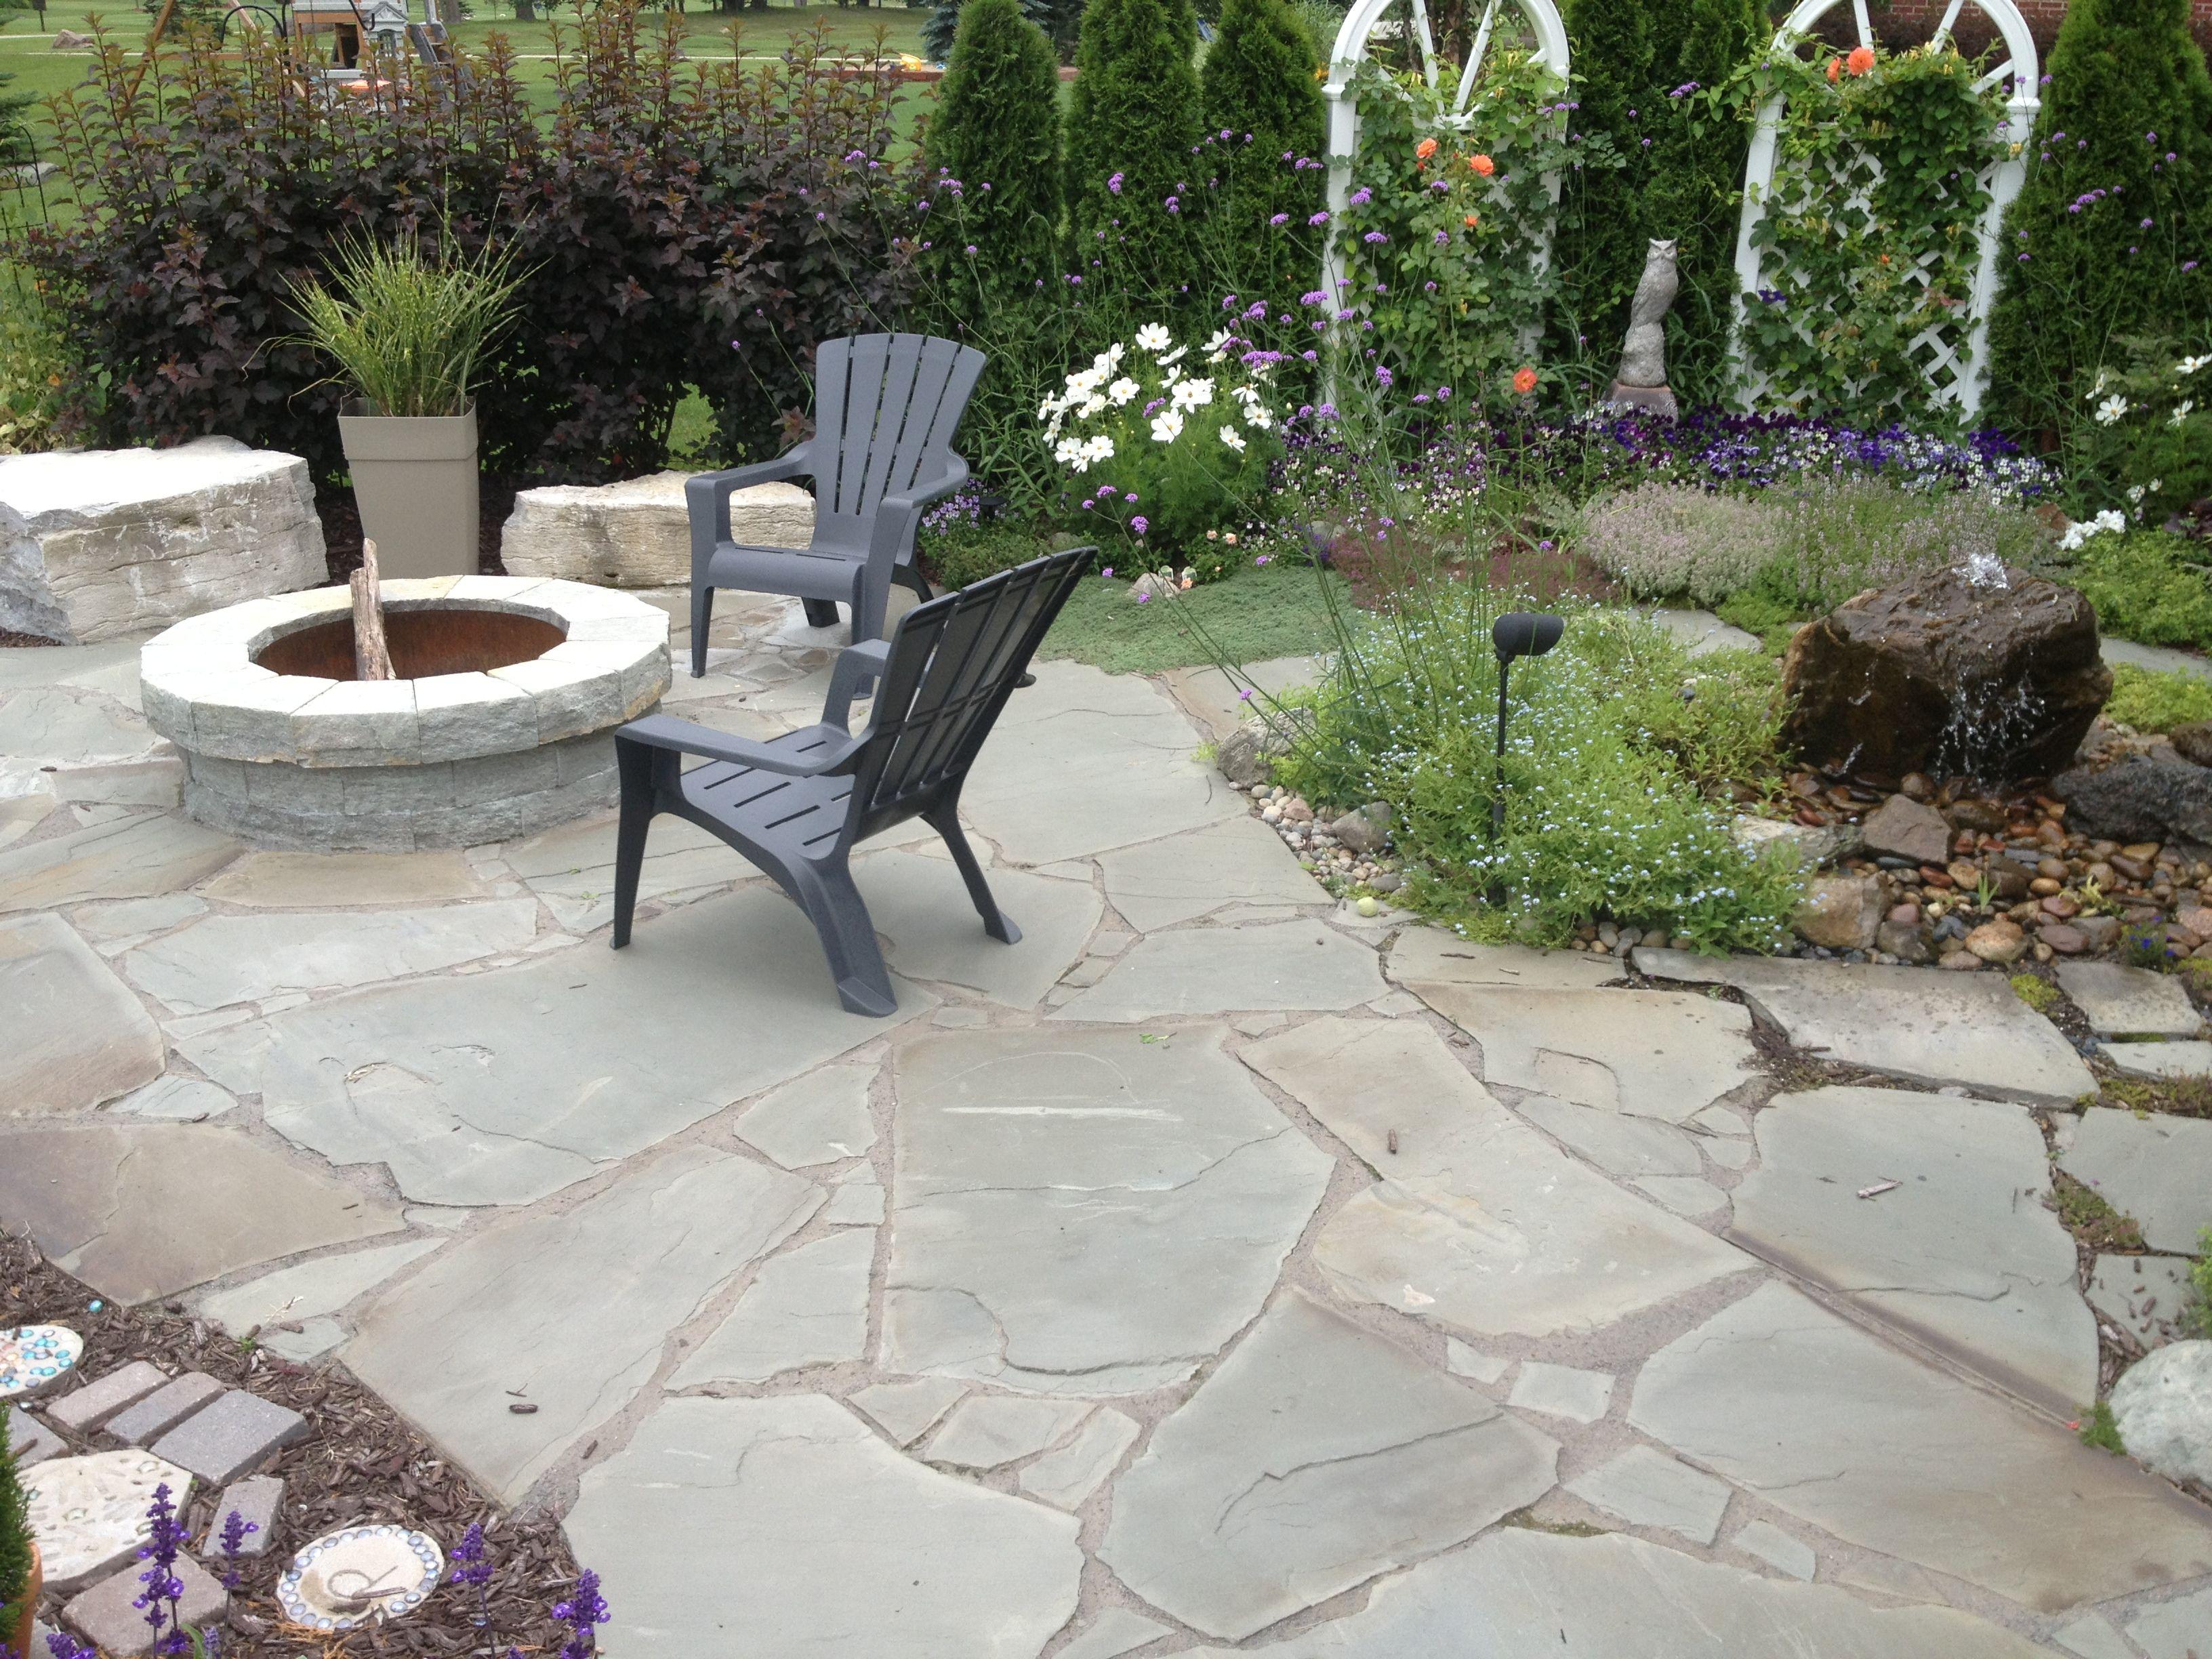 New York Blue Irregular Flagstone Cottage Garden Design Outdoor Patio Fire Pit Patio